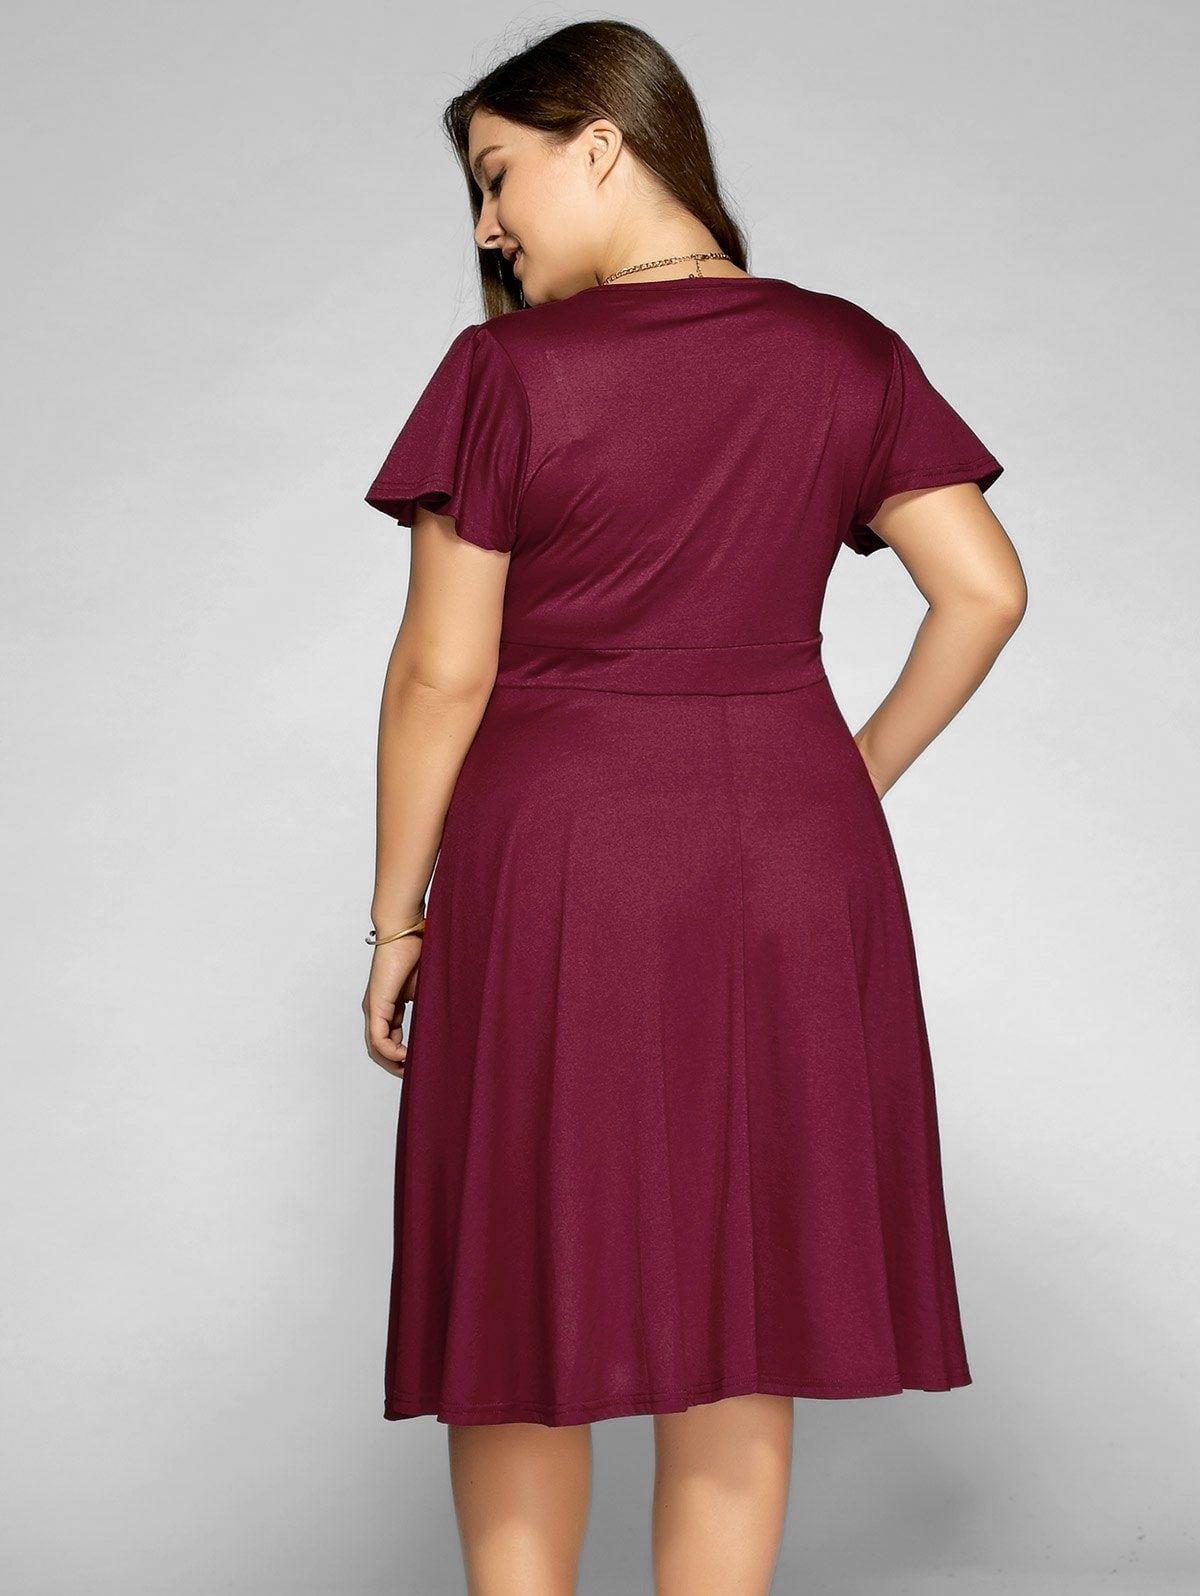 Low Cut A Line Plus Size Surplice Front Tie Swing Dress ...